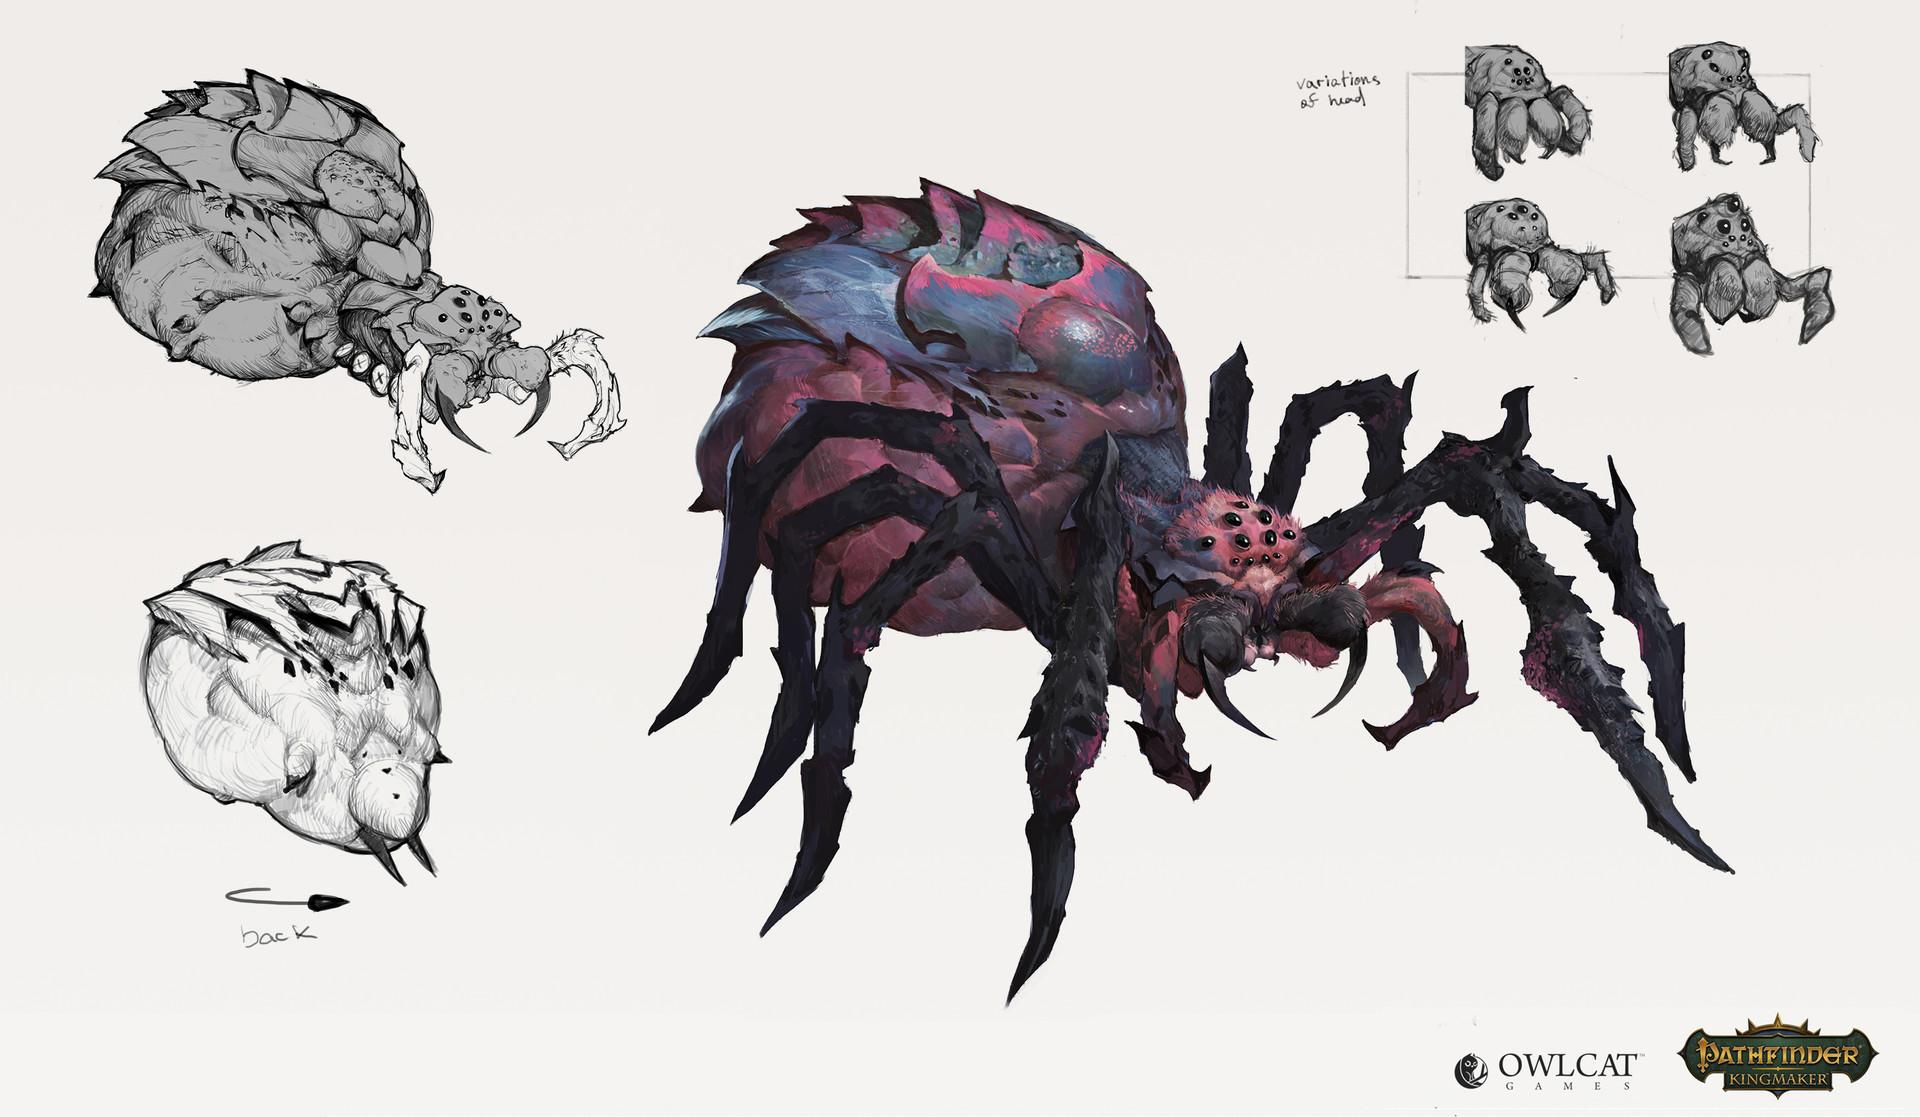 Паук - Pathfinder: Kingmaker Арт